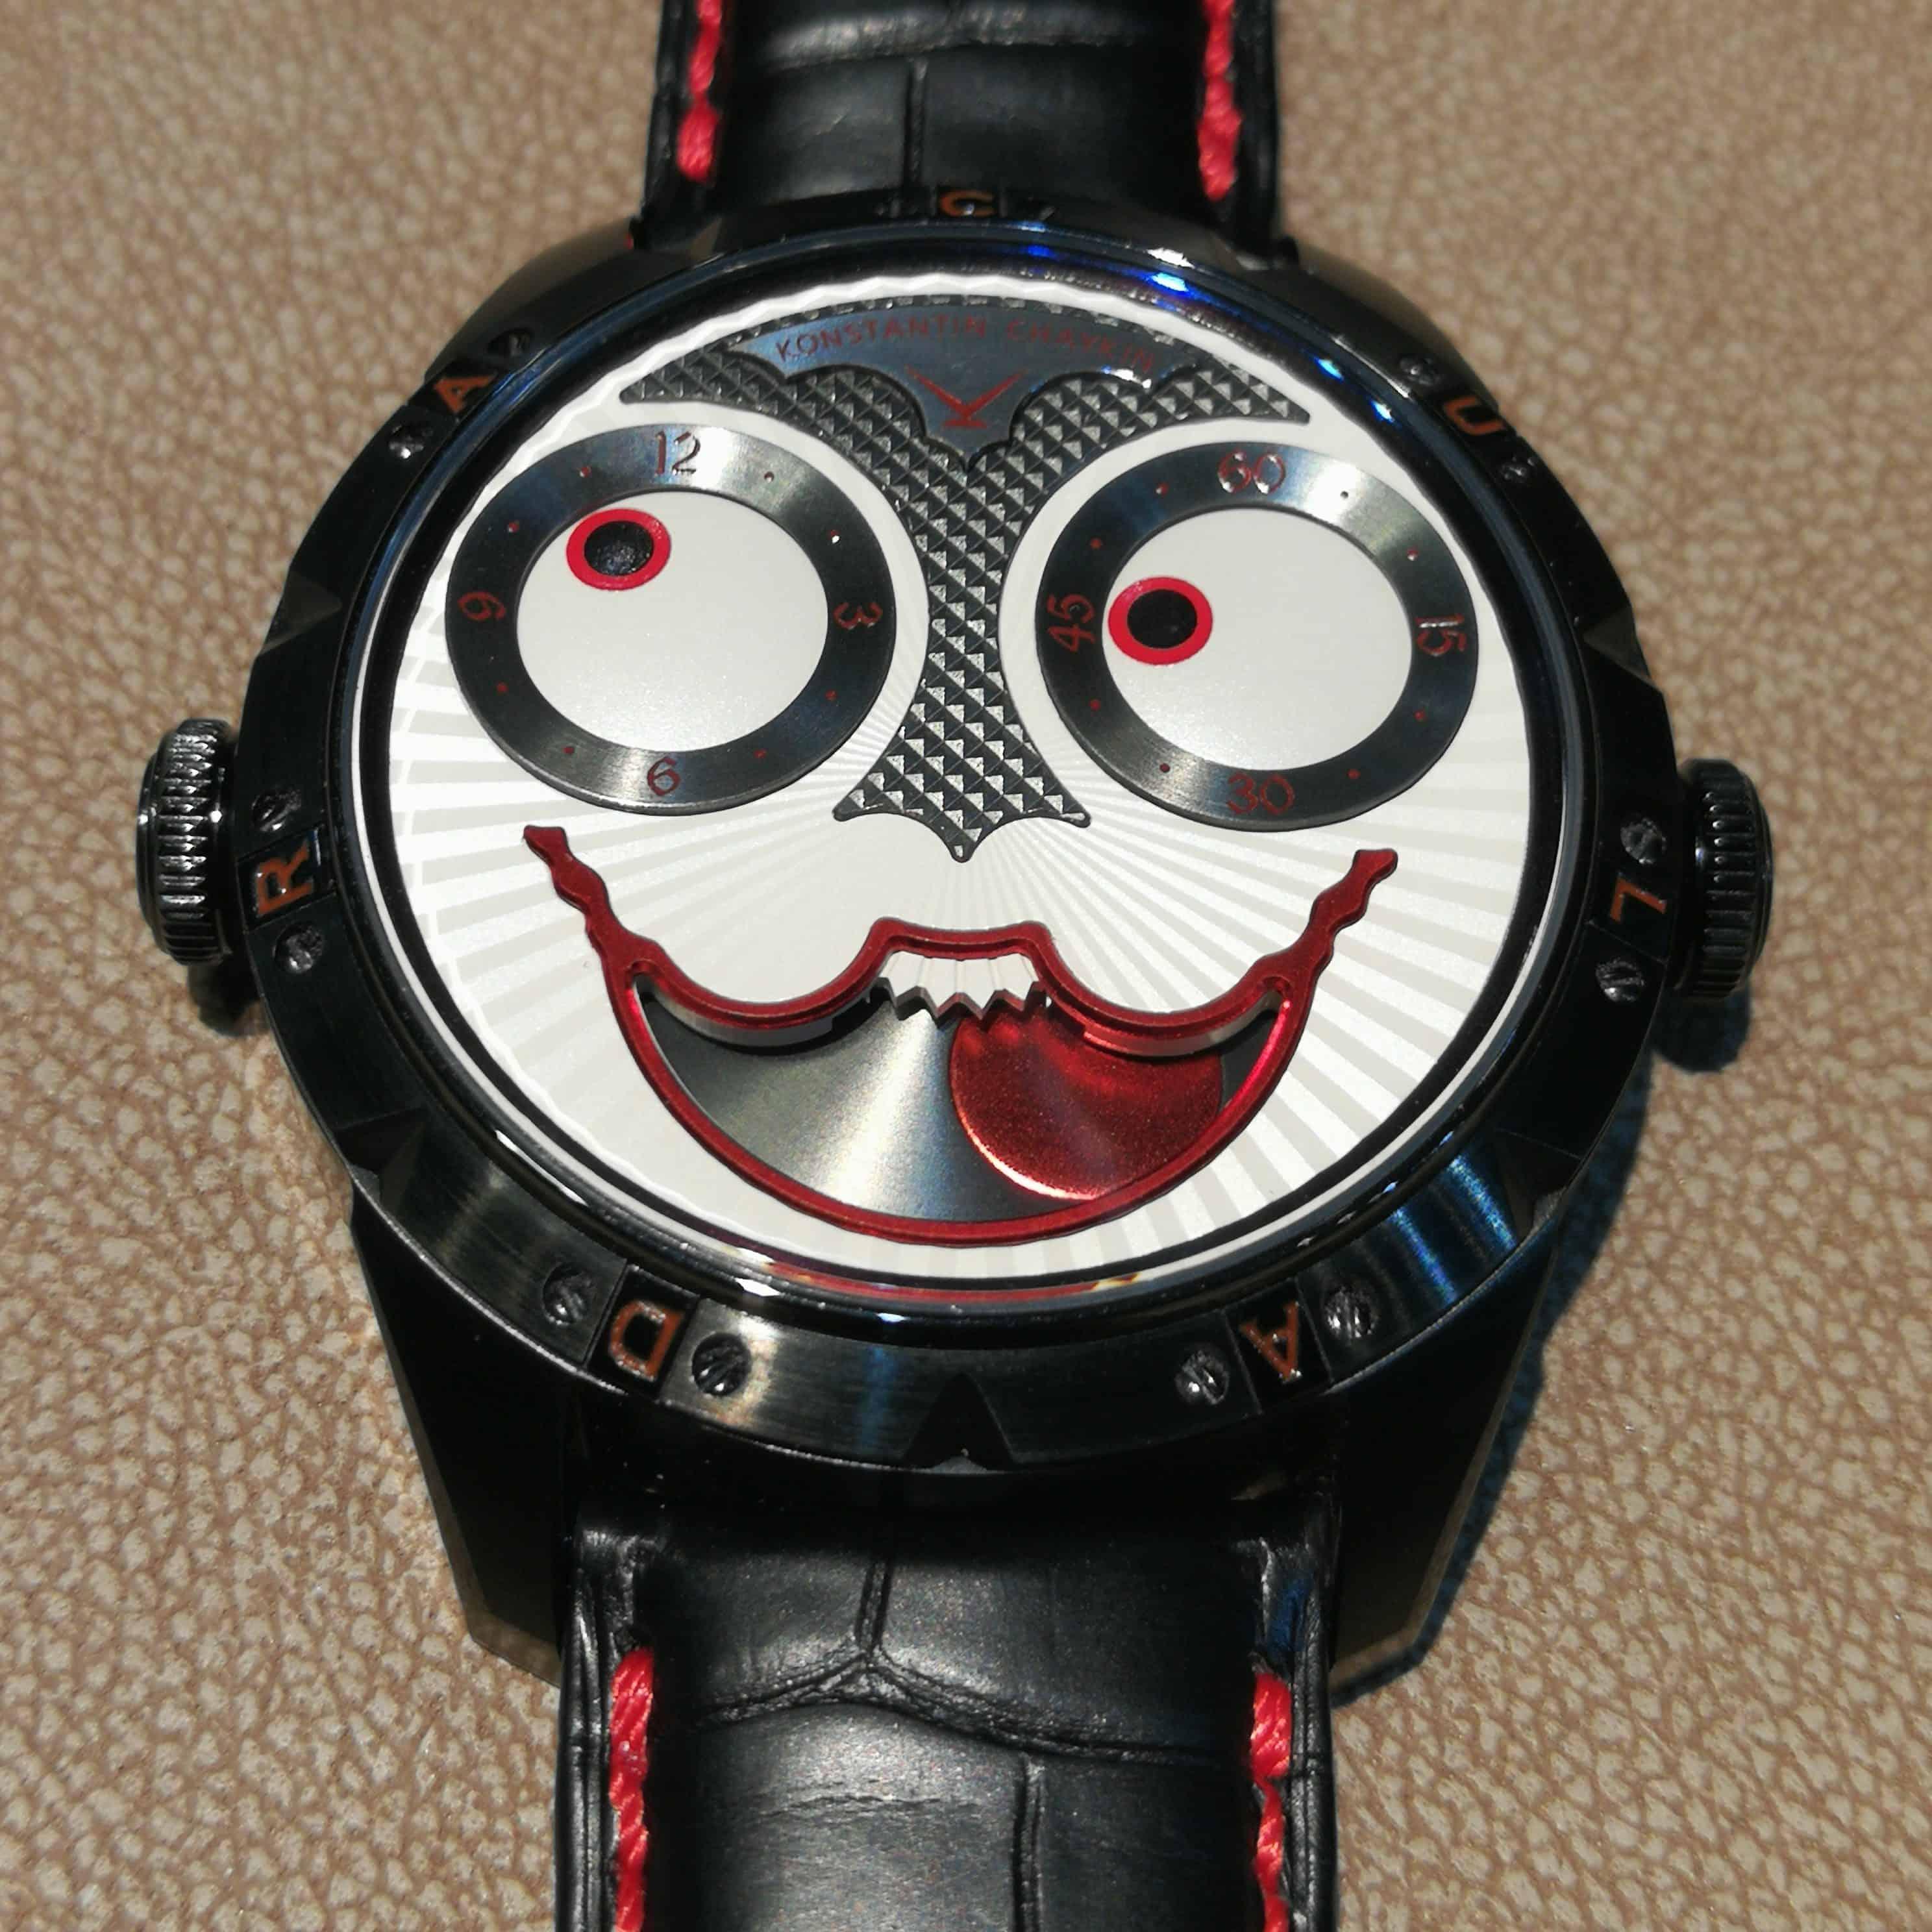 Konstantin Chaykin Joker Dracula Review – About Timepieces